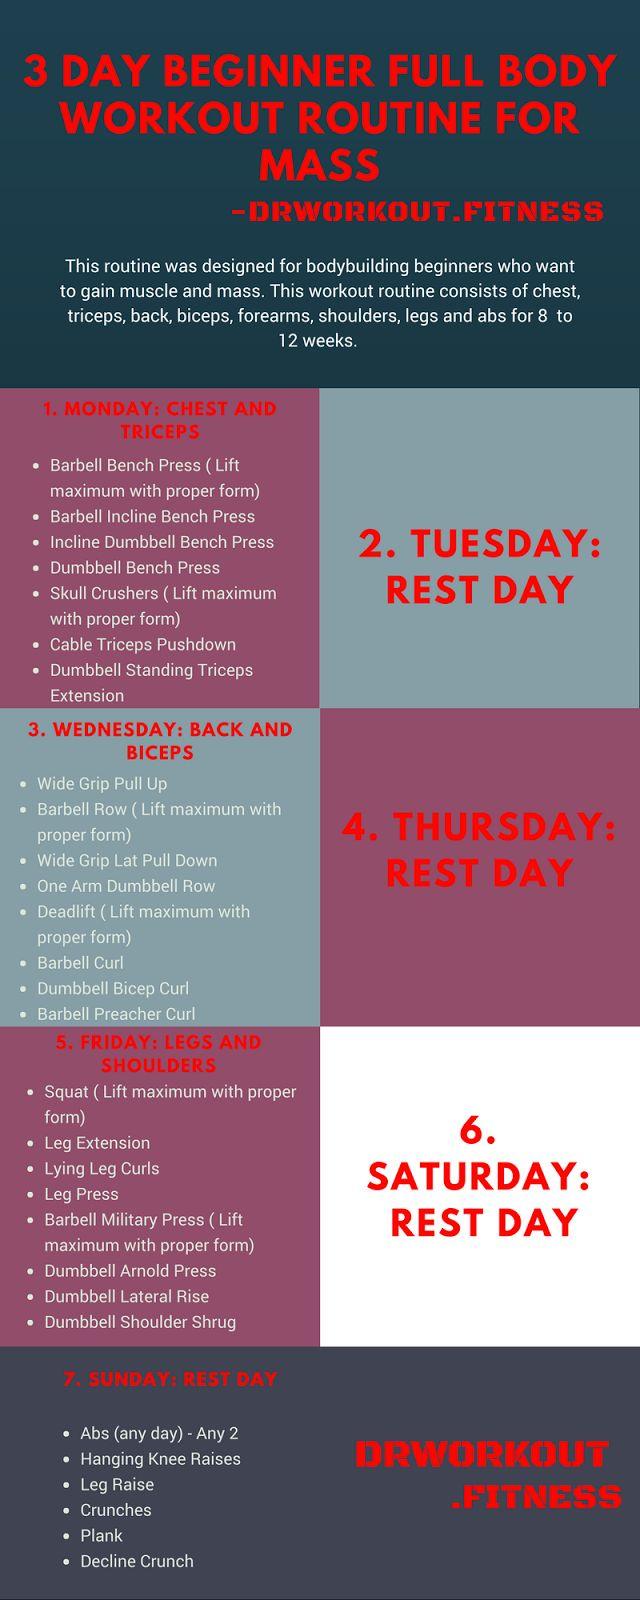 Beginner Full Body Workout | Posted By: AdvancedWeightLossTips.com